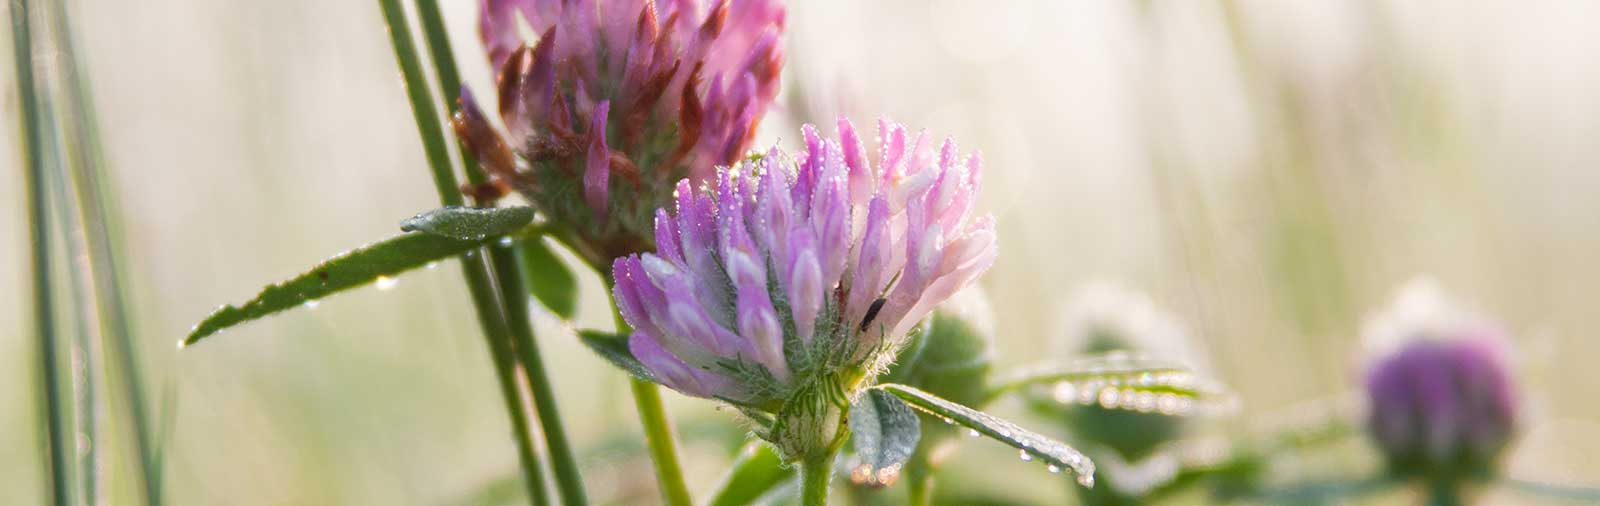 Rode Klaver - Trifolium pratense L.